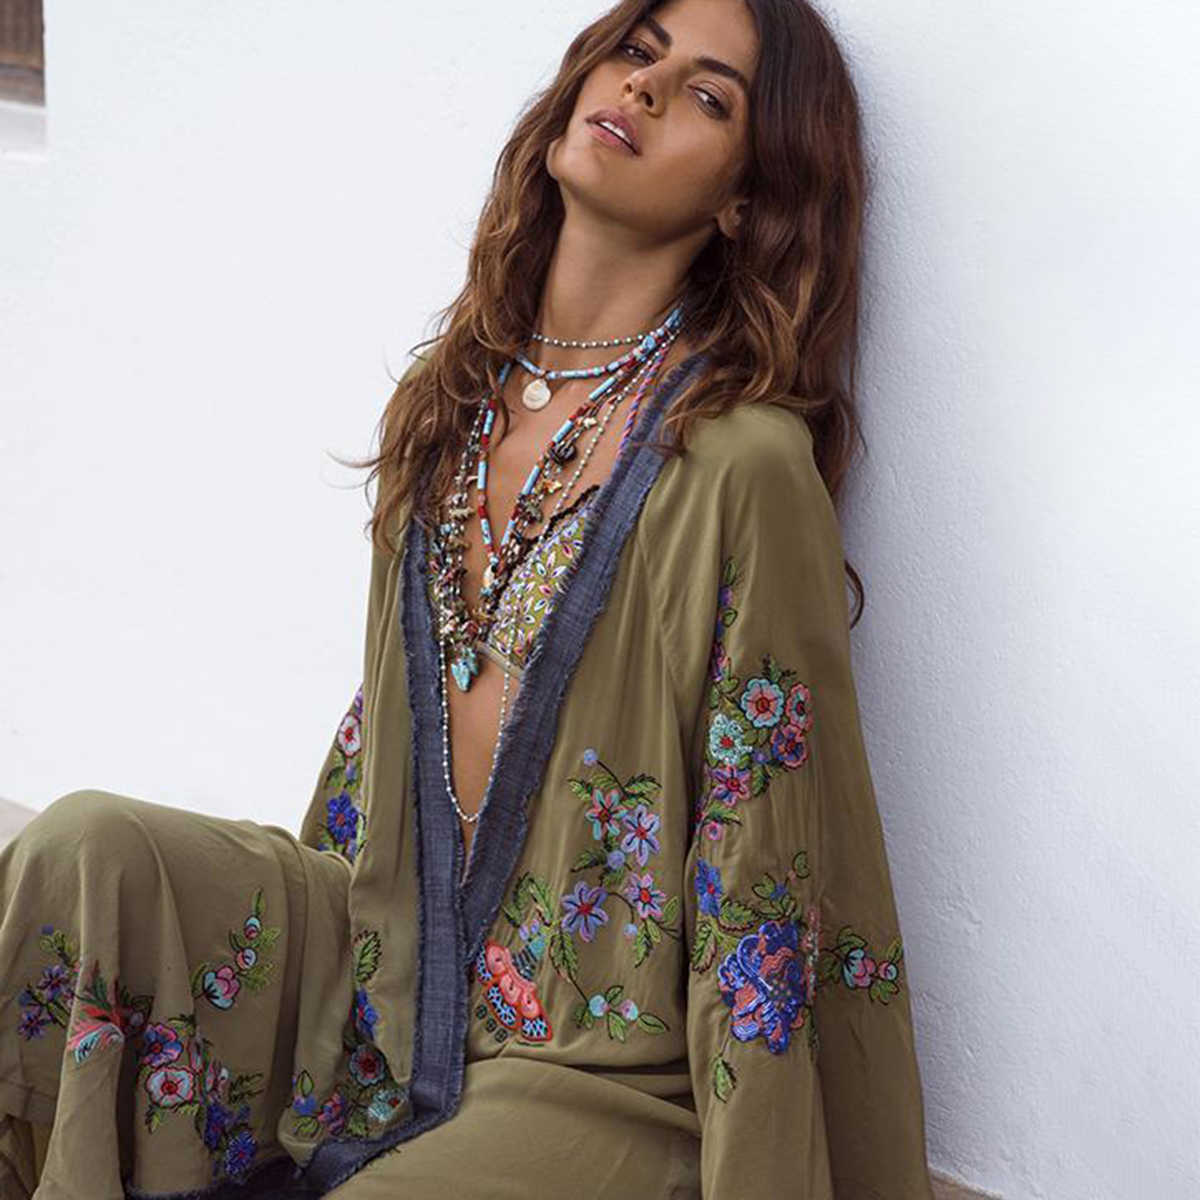 01a722cb8f ... National Boho Kimono Women 2019 Summer Long Sleeve Floral Embroidery  Long Cardigan Jacket Beach Wear Hippie ...